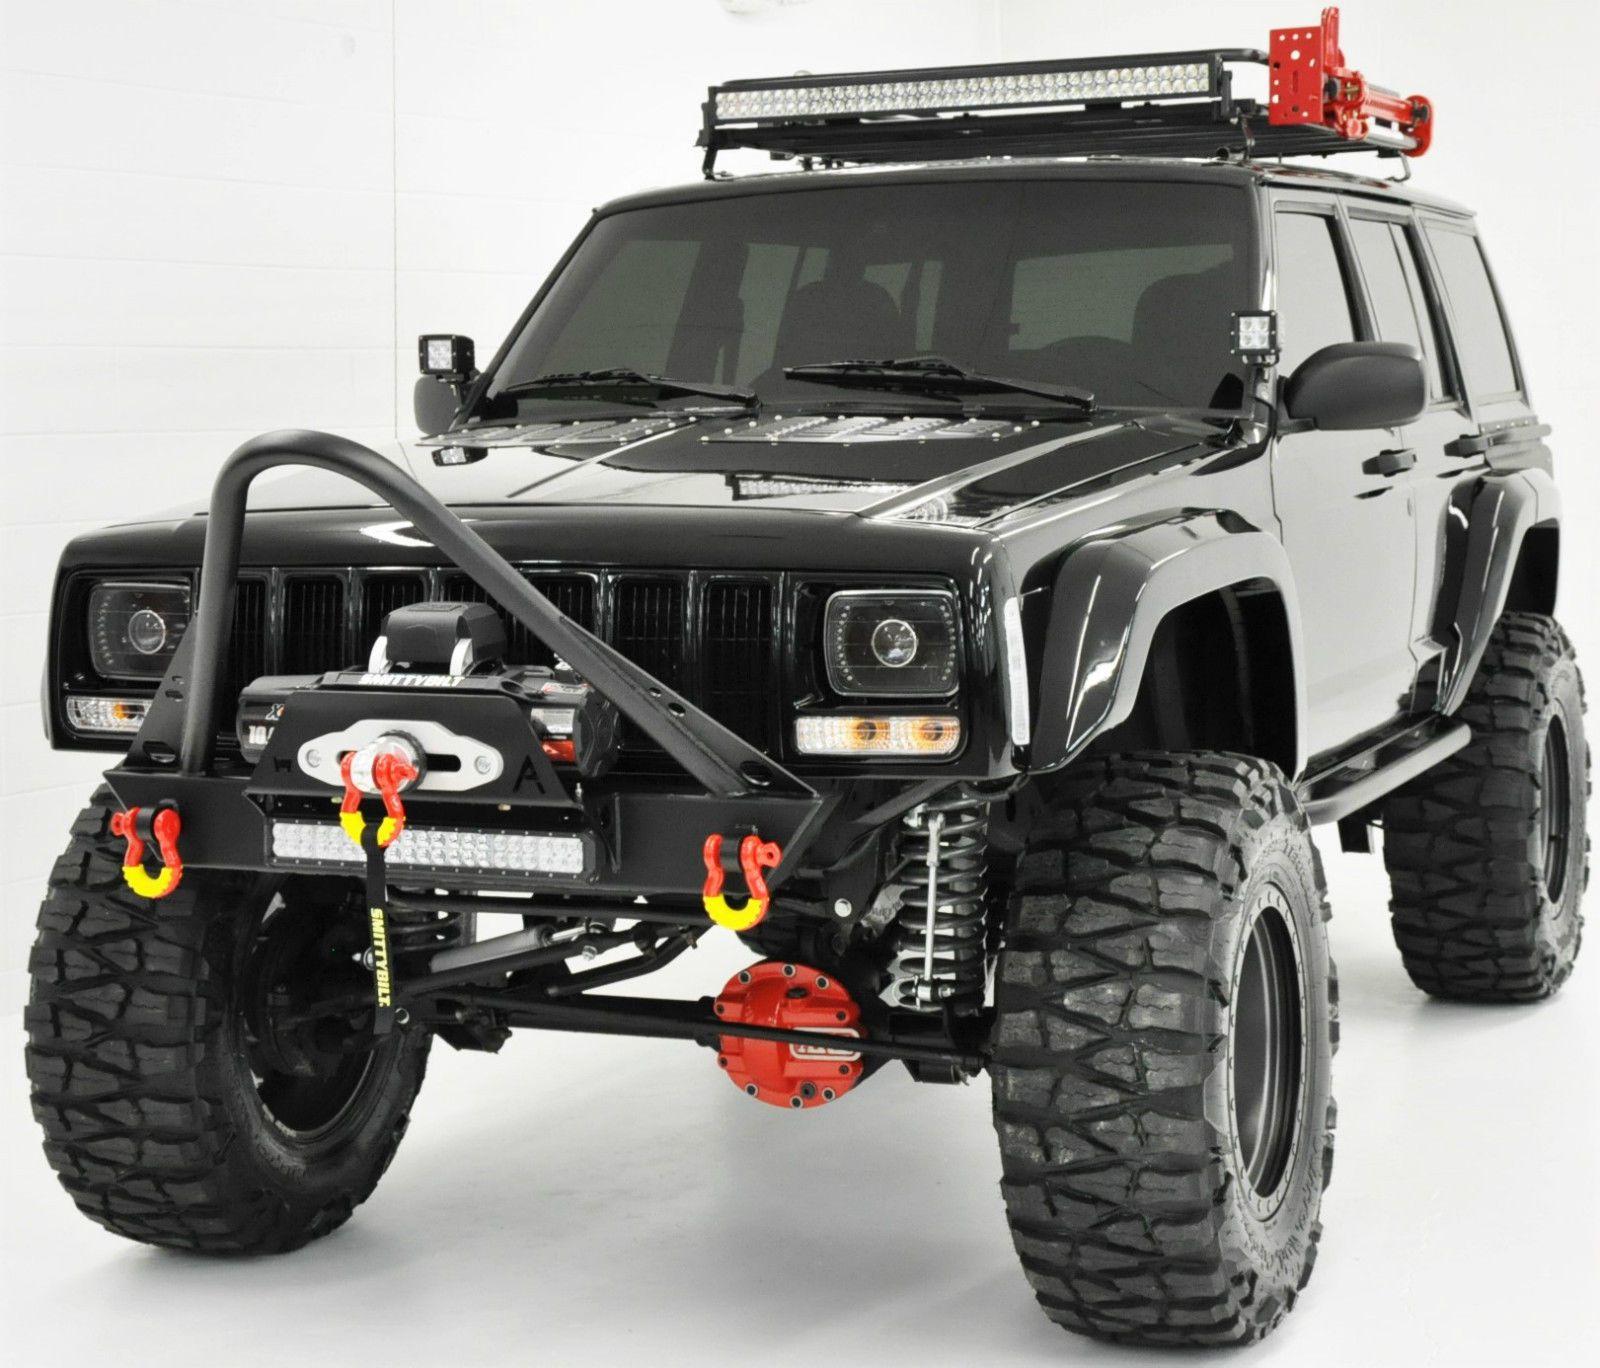 Jeep Cherokee Xj Ebay Jeep Cherokee Xj Jeep Xj Jeep Cherokee